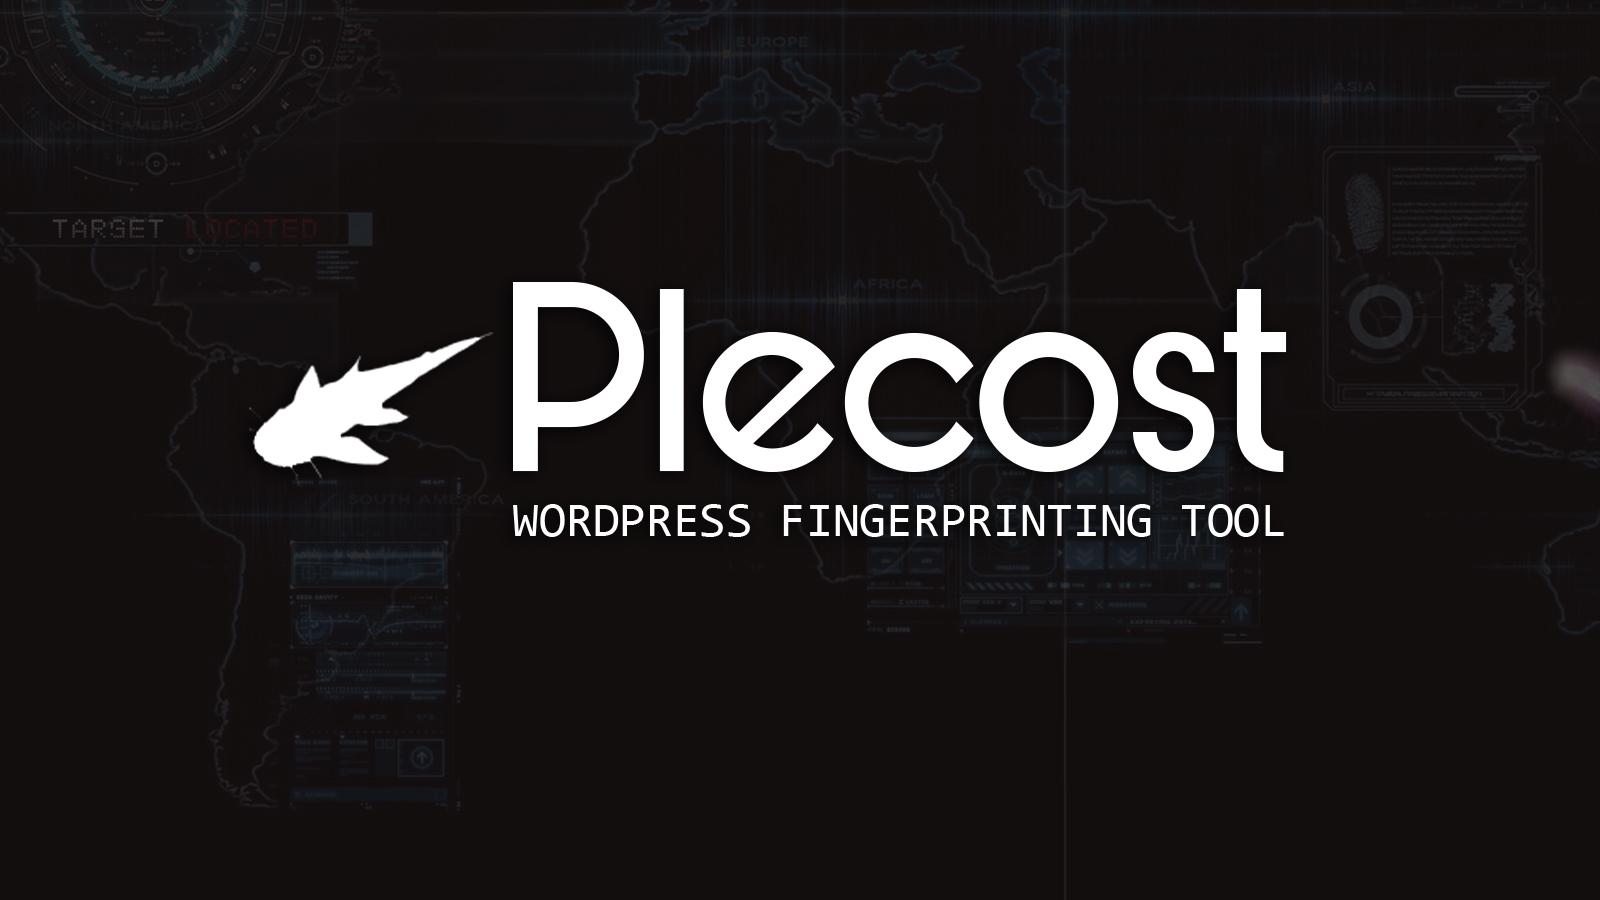 Plecost - WordPress Fingerprinting Tool